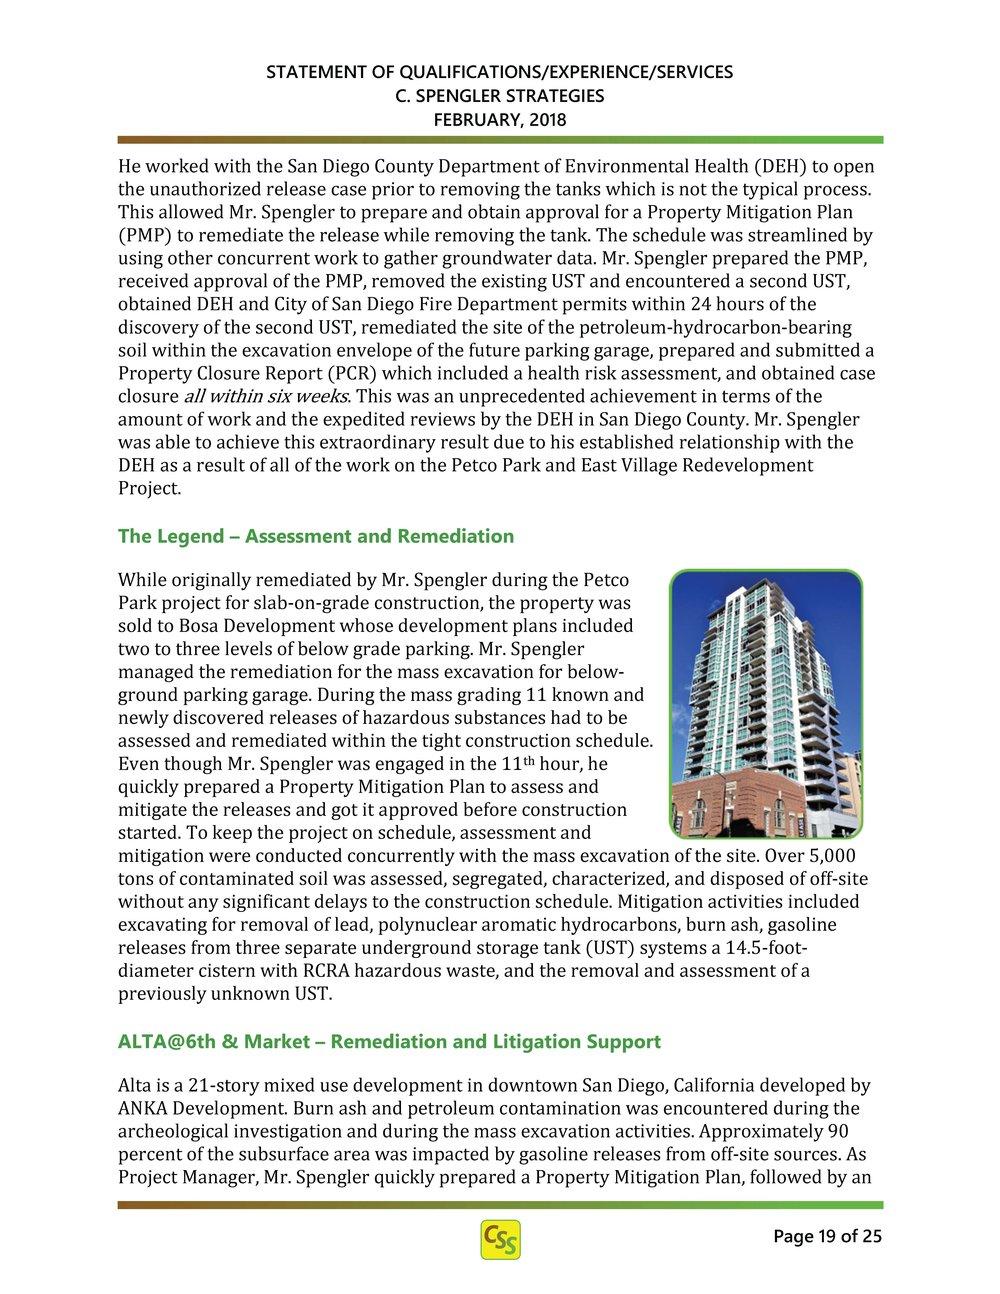 C.Spengler Strategies SOQ.2.13.18_Page_20.jpg